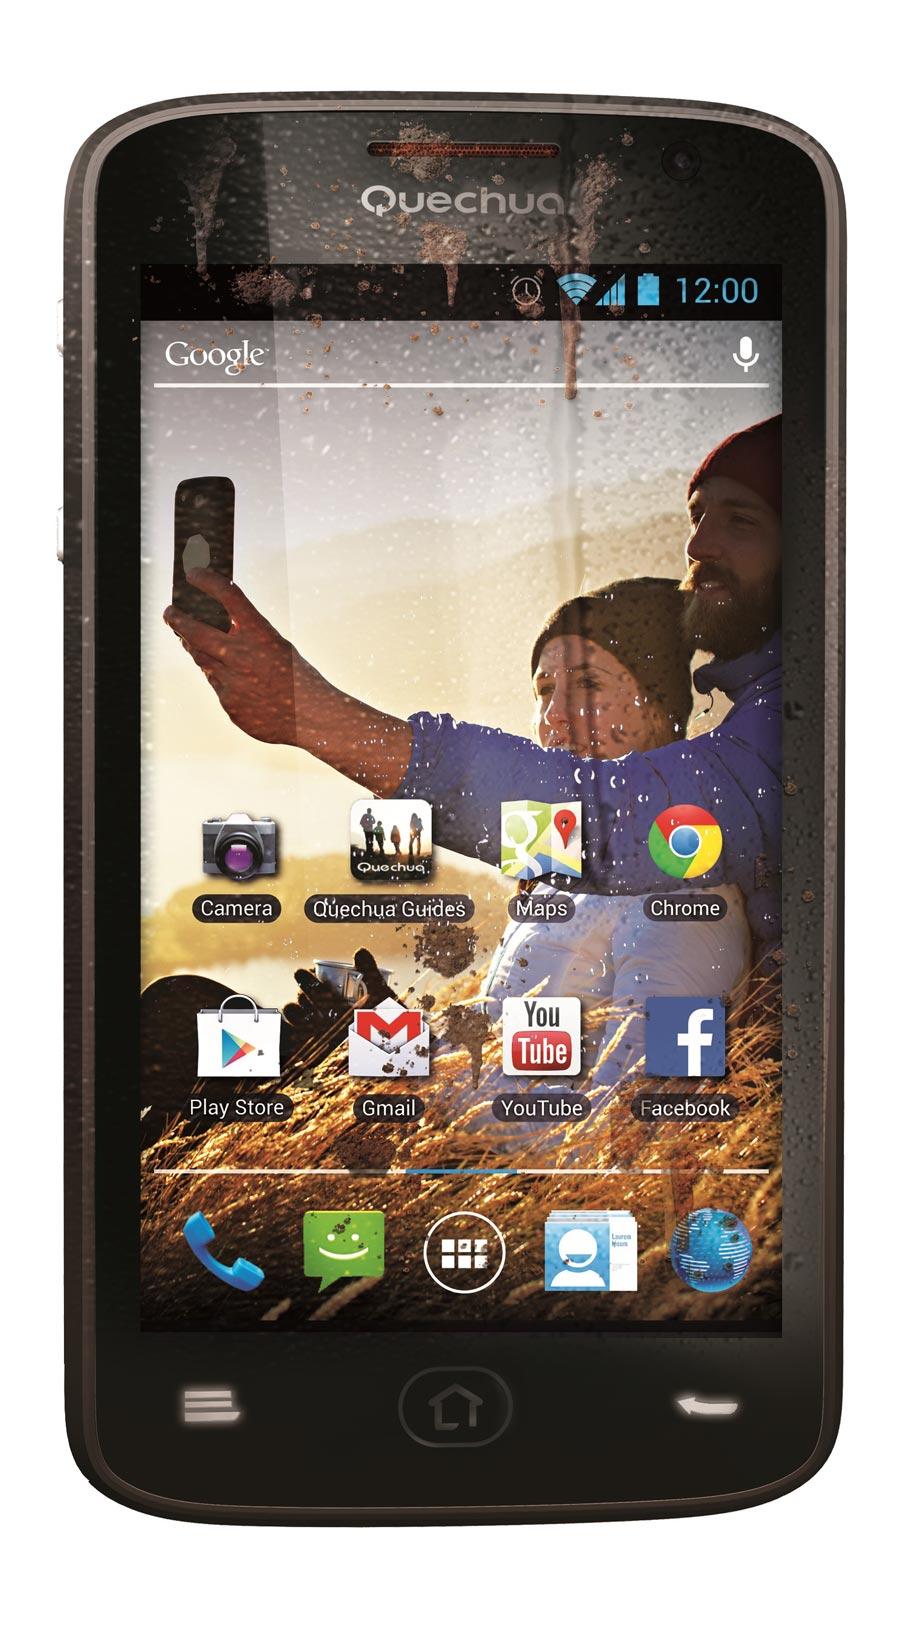 Le smartphone Quechua Phone 5.